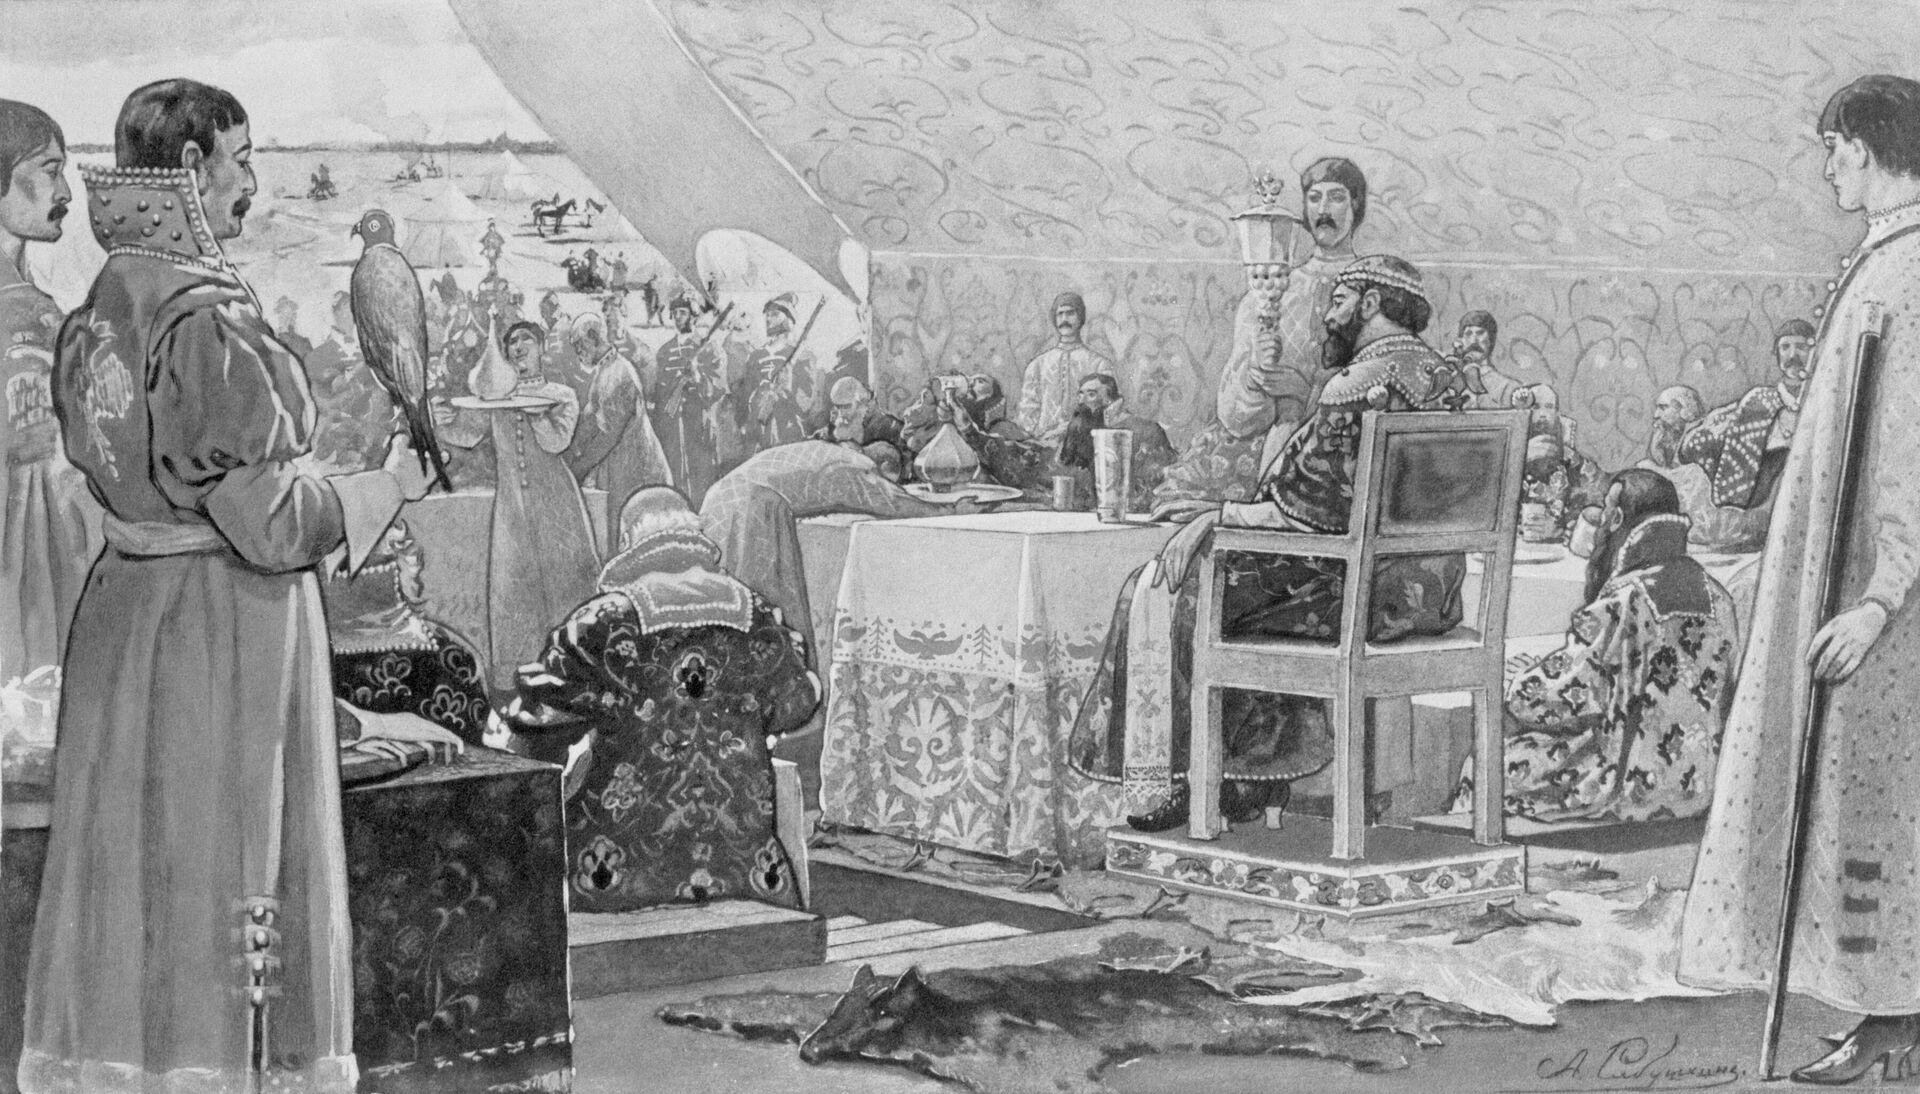 Пир царя Алексея Михайловича с ближними боярами в отъезжем поле. - РИА Новости, 1920, 13.11.2020